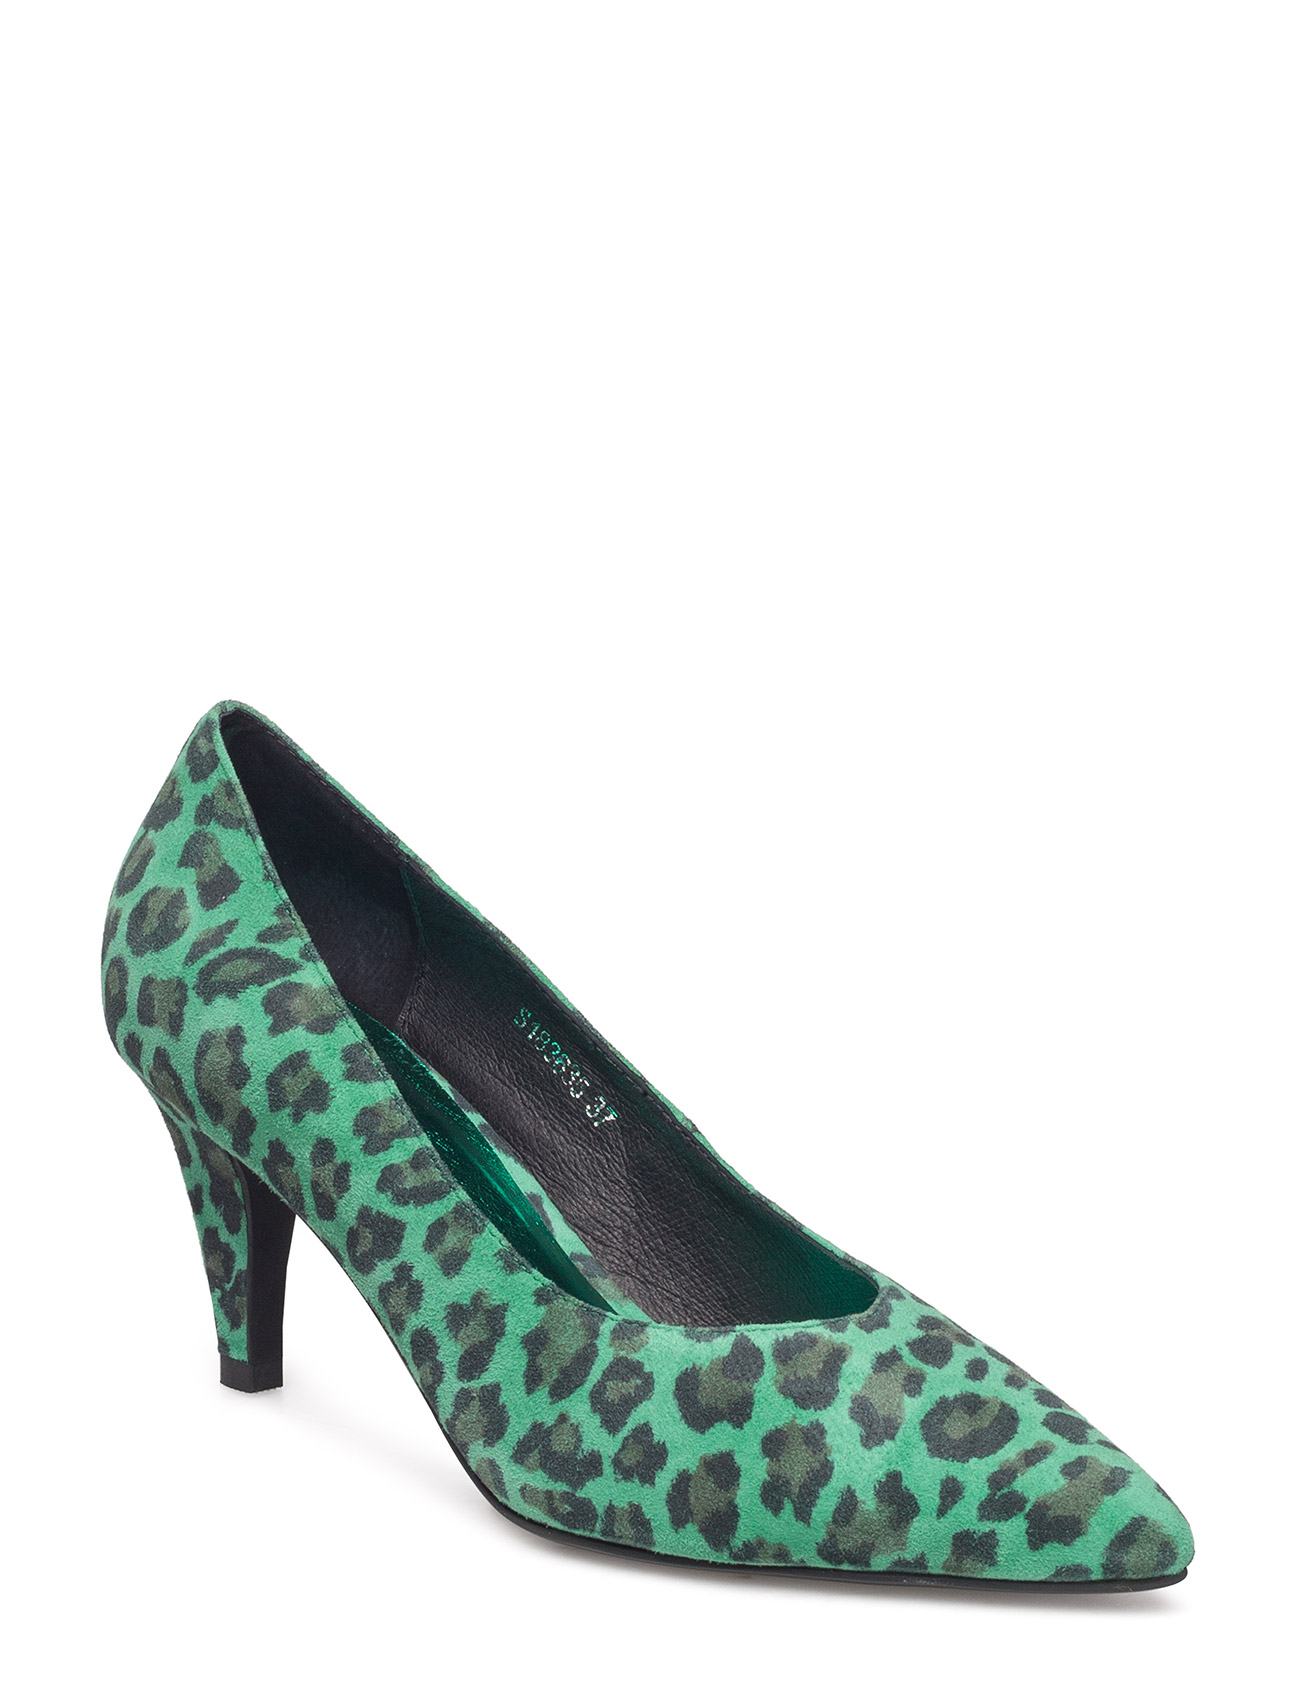 8aa29104926 Sofie Schnoor Shoe Stiletto Leo GREEN LEOPARD, hinta 165 €